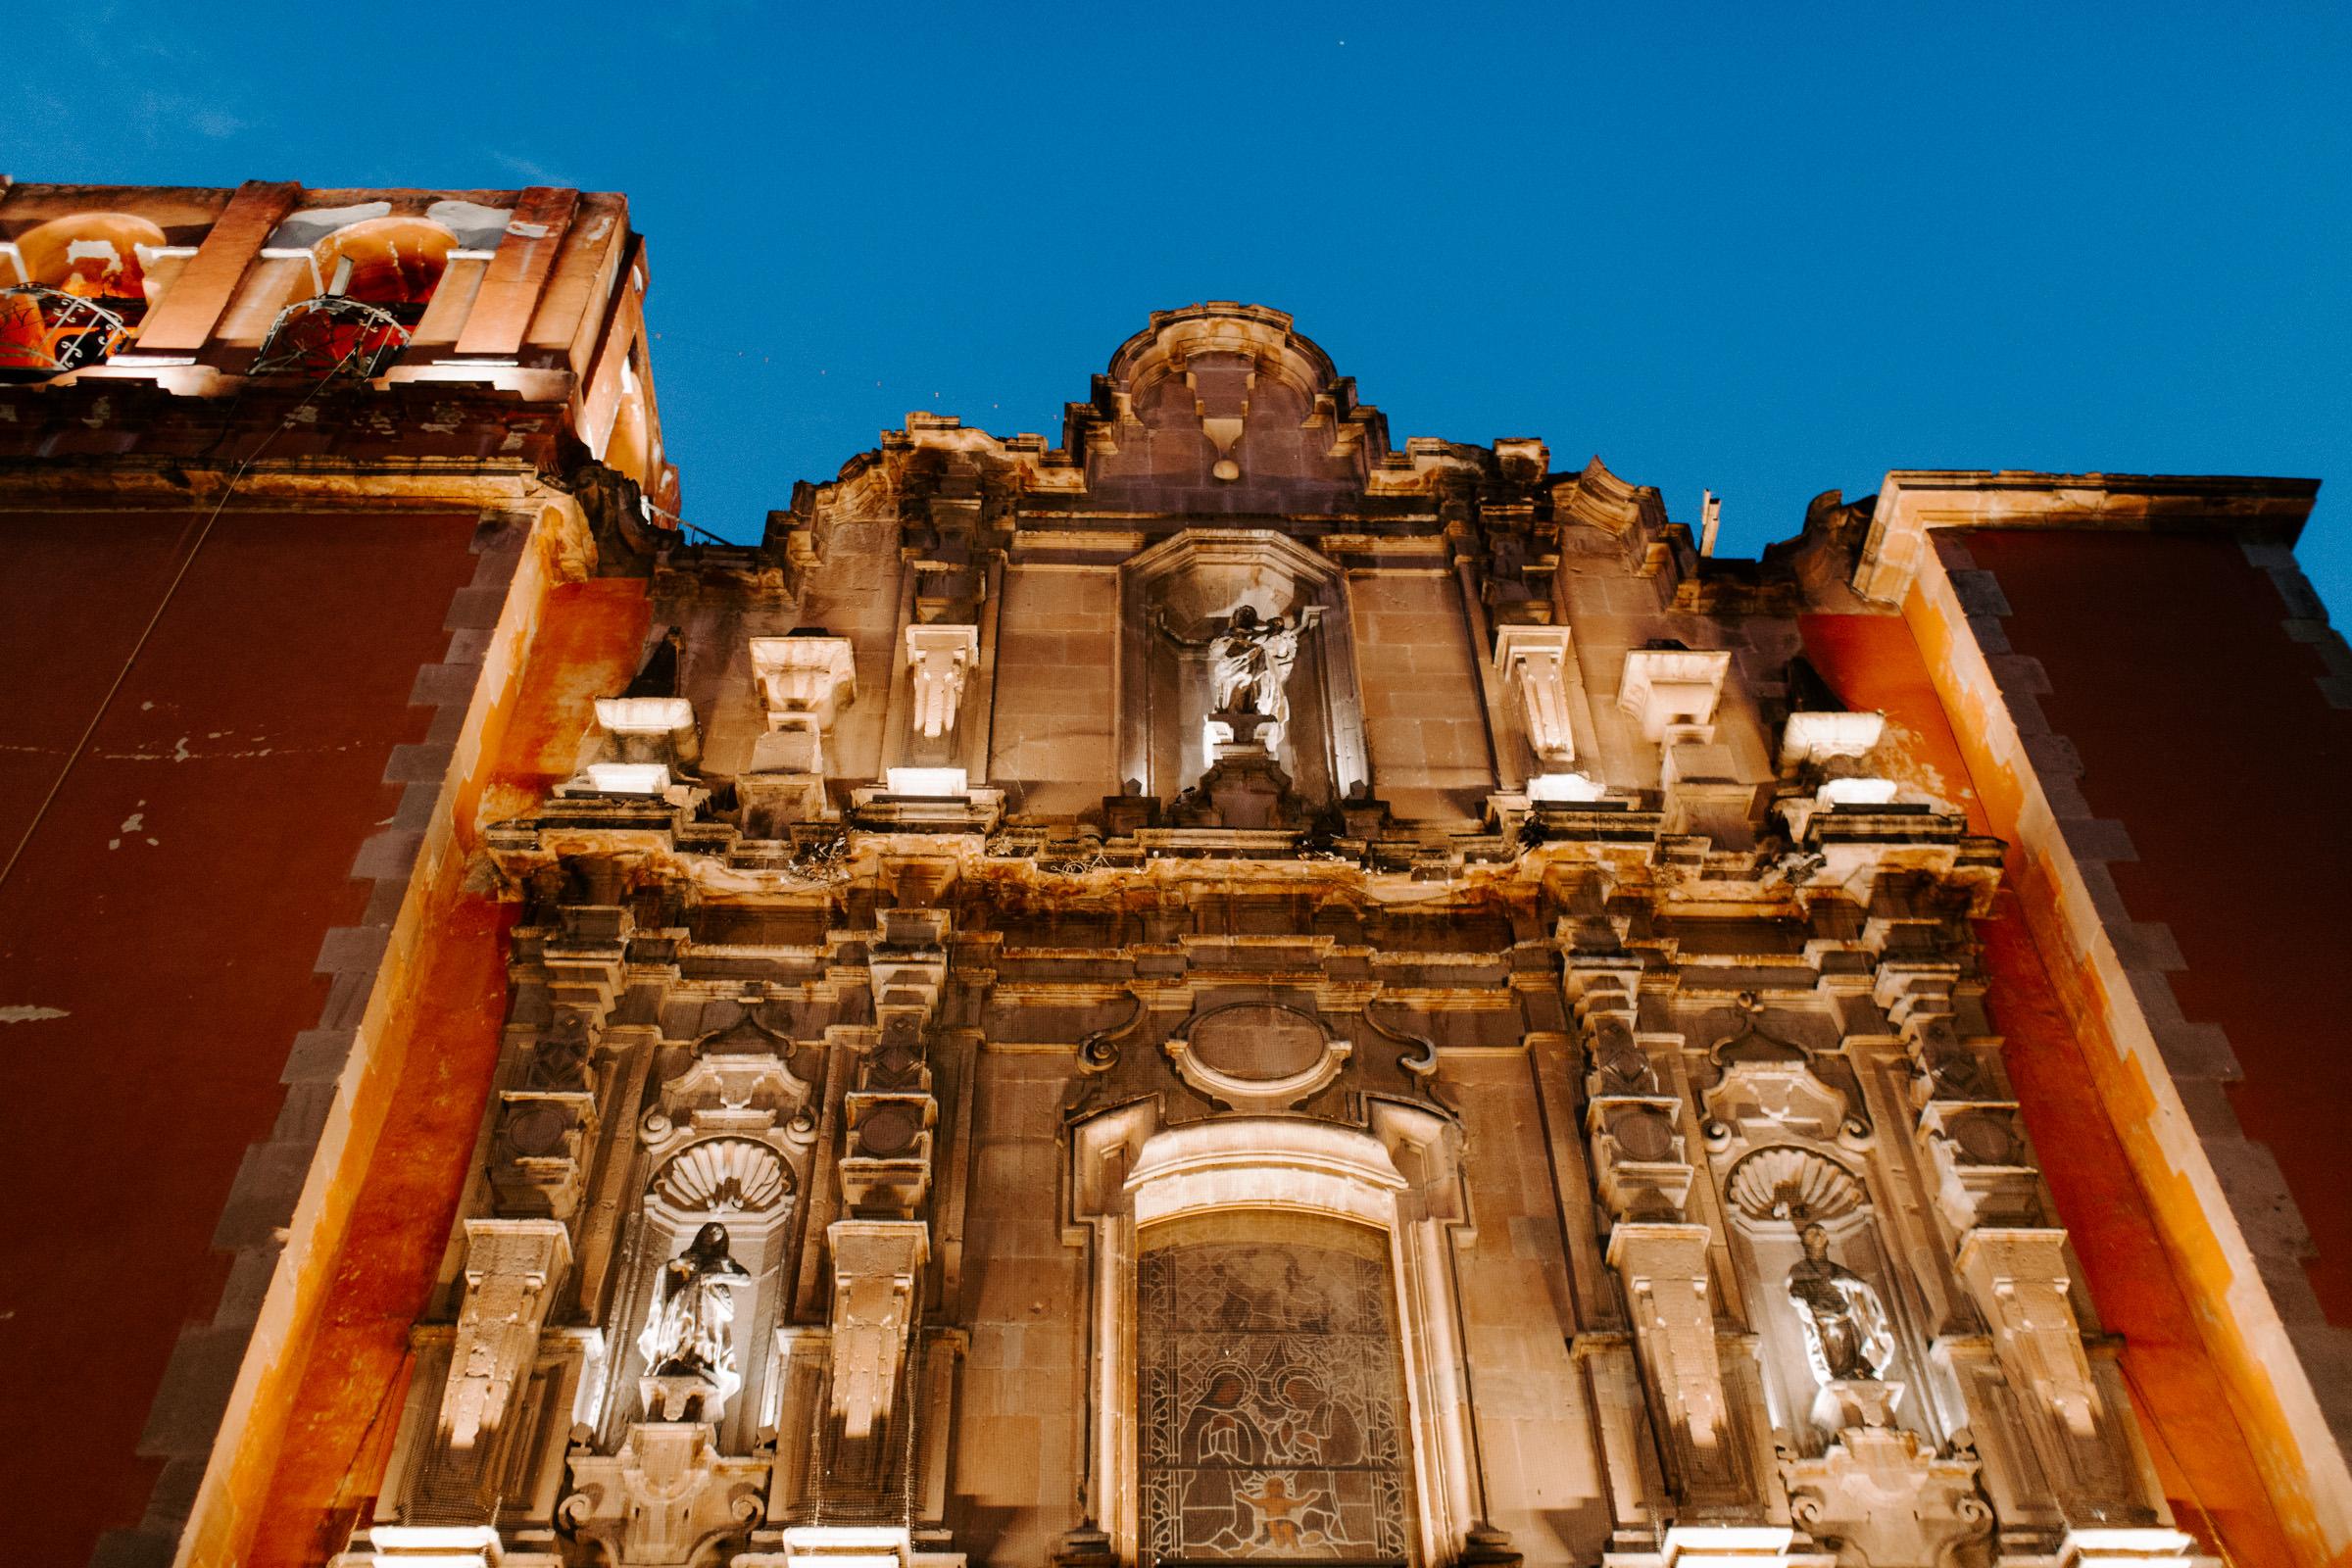 Casa-del-Rector-Hotel-Guanajuato-Bodas-Fotografo-Antigua-Hacienda-Barrera-VK-Pierce-0105.JPG